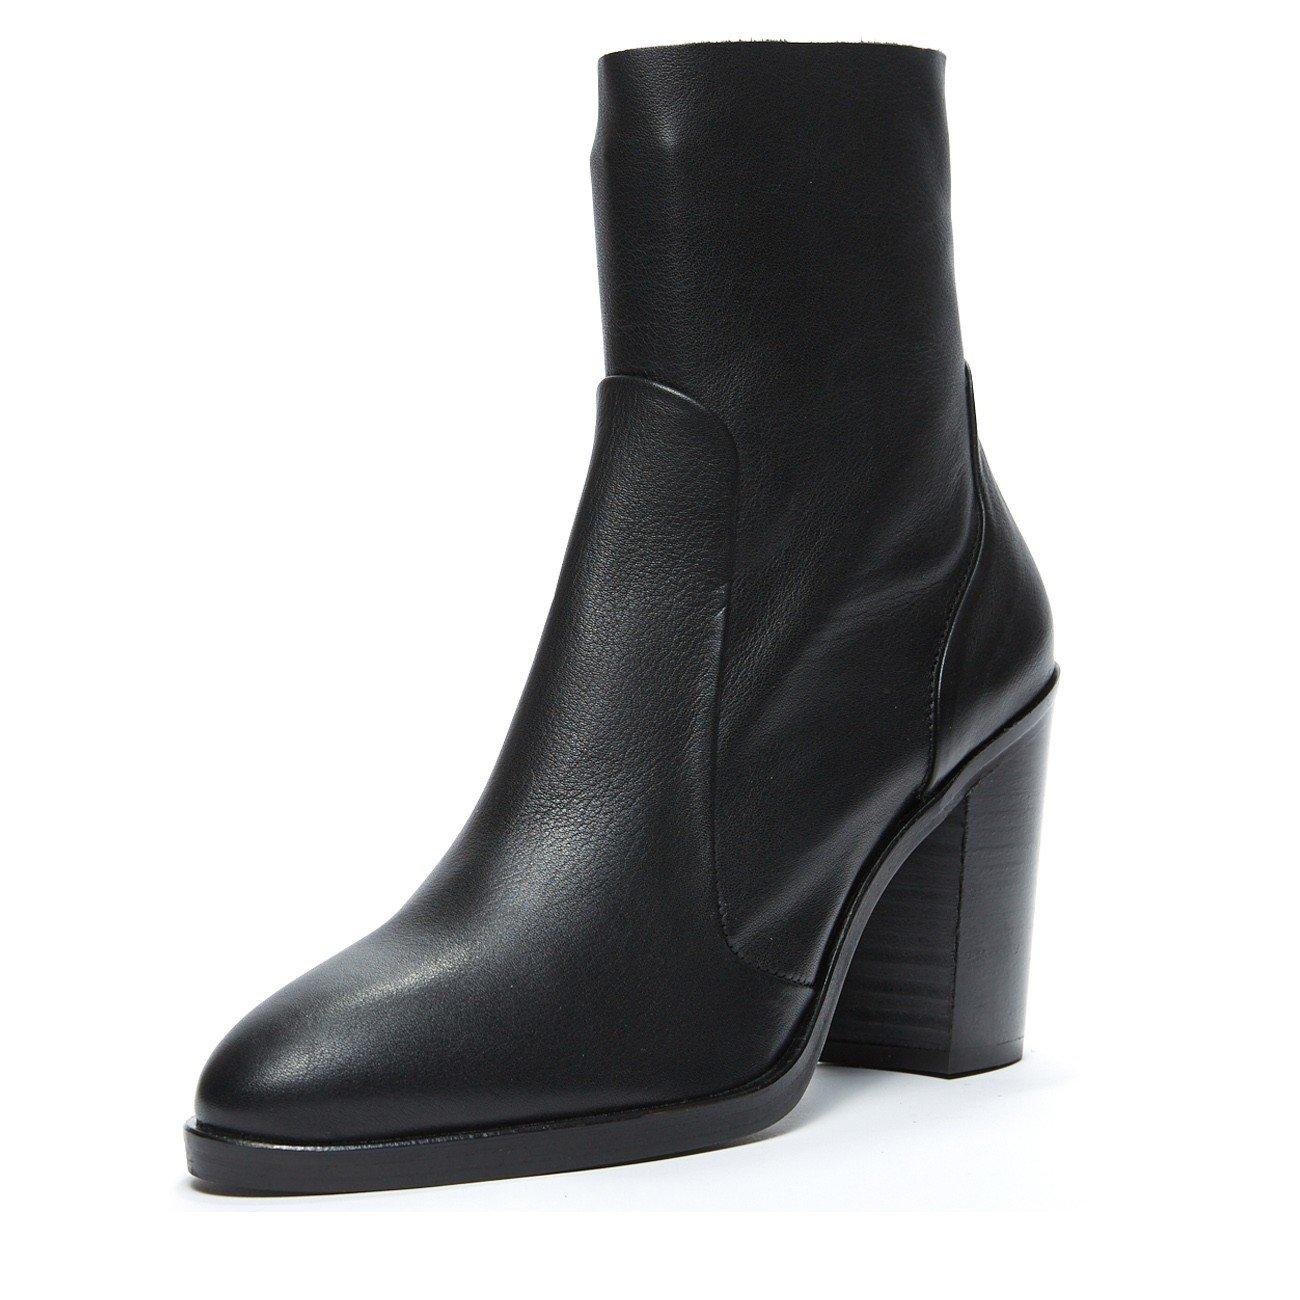 Crosswalk 3373 Leather Ankle Bootie Black B07CMD4VXG 38 EU